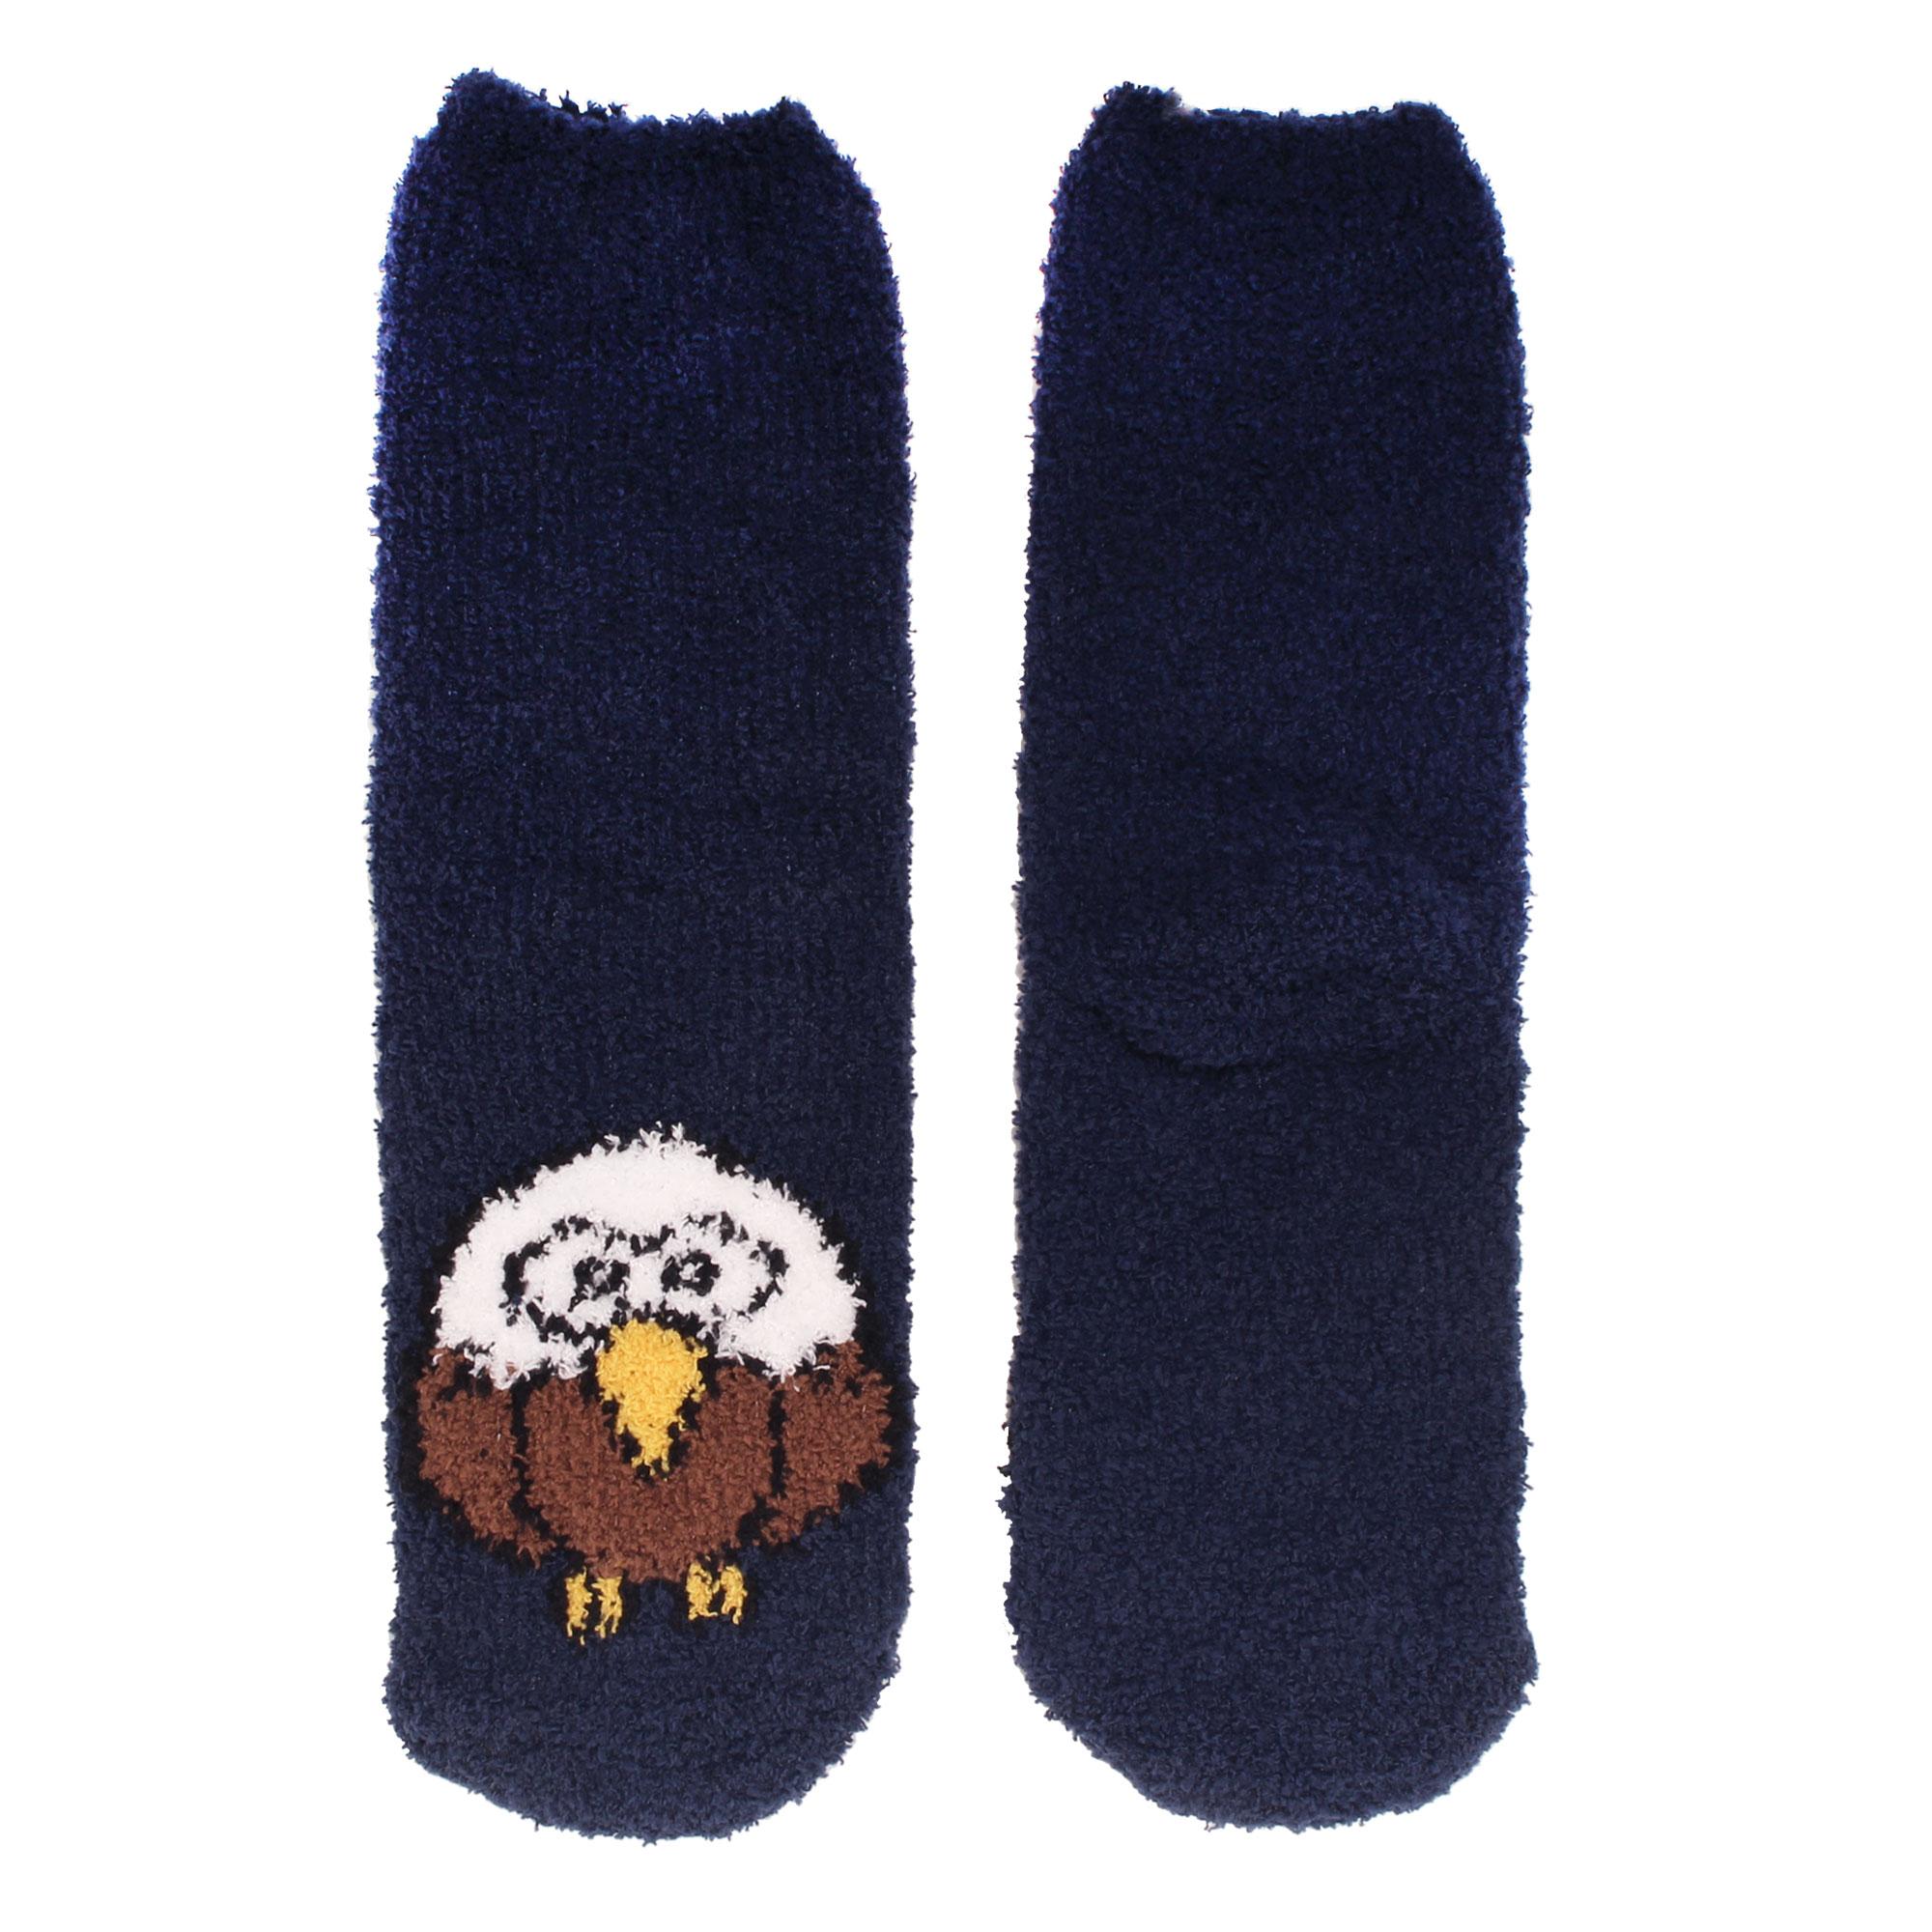 Asst 18 Women/'s Fuzzy Cozy Warm Cute Animal Home Bed Cabin Socks 3 Pair